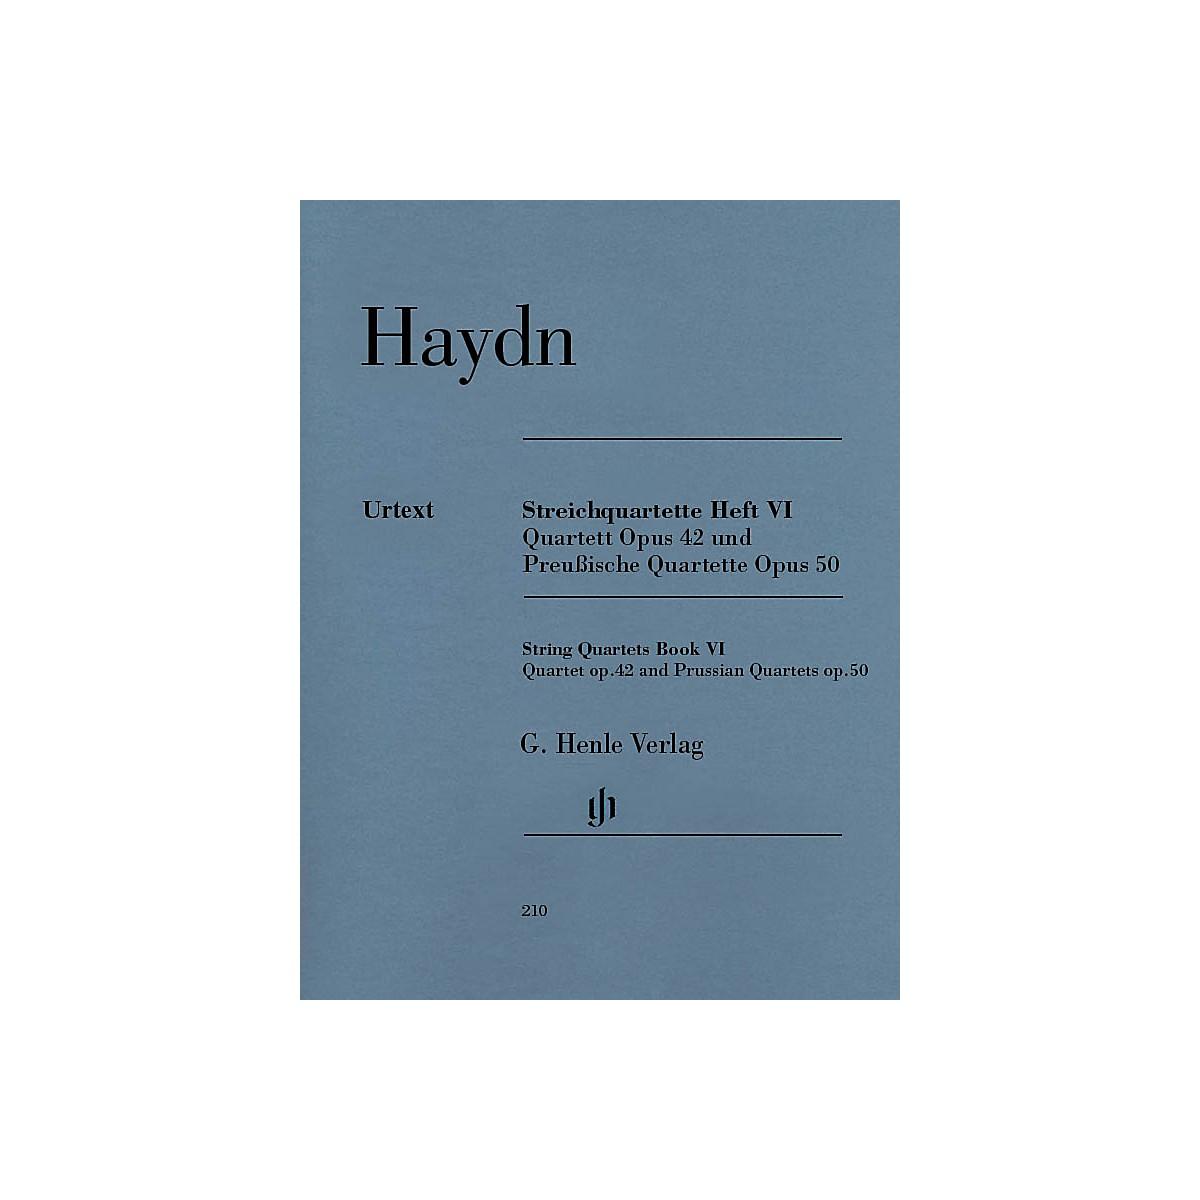 G. Henle Verlag String Quartets, Vol. VI, Op.42 and Op.50 (Prussian Quartets) Henle Music Folios by Joseph Haydn